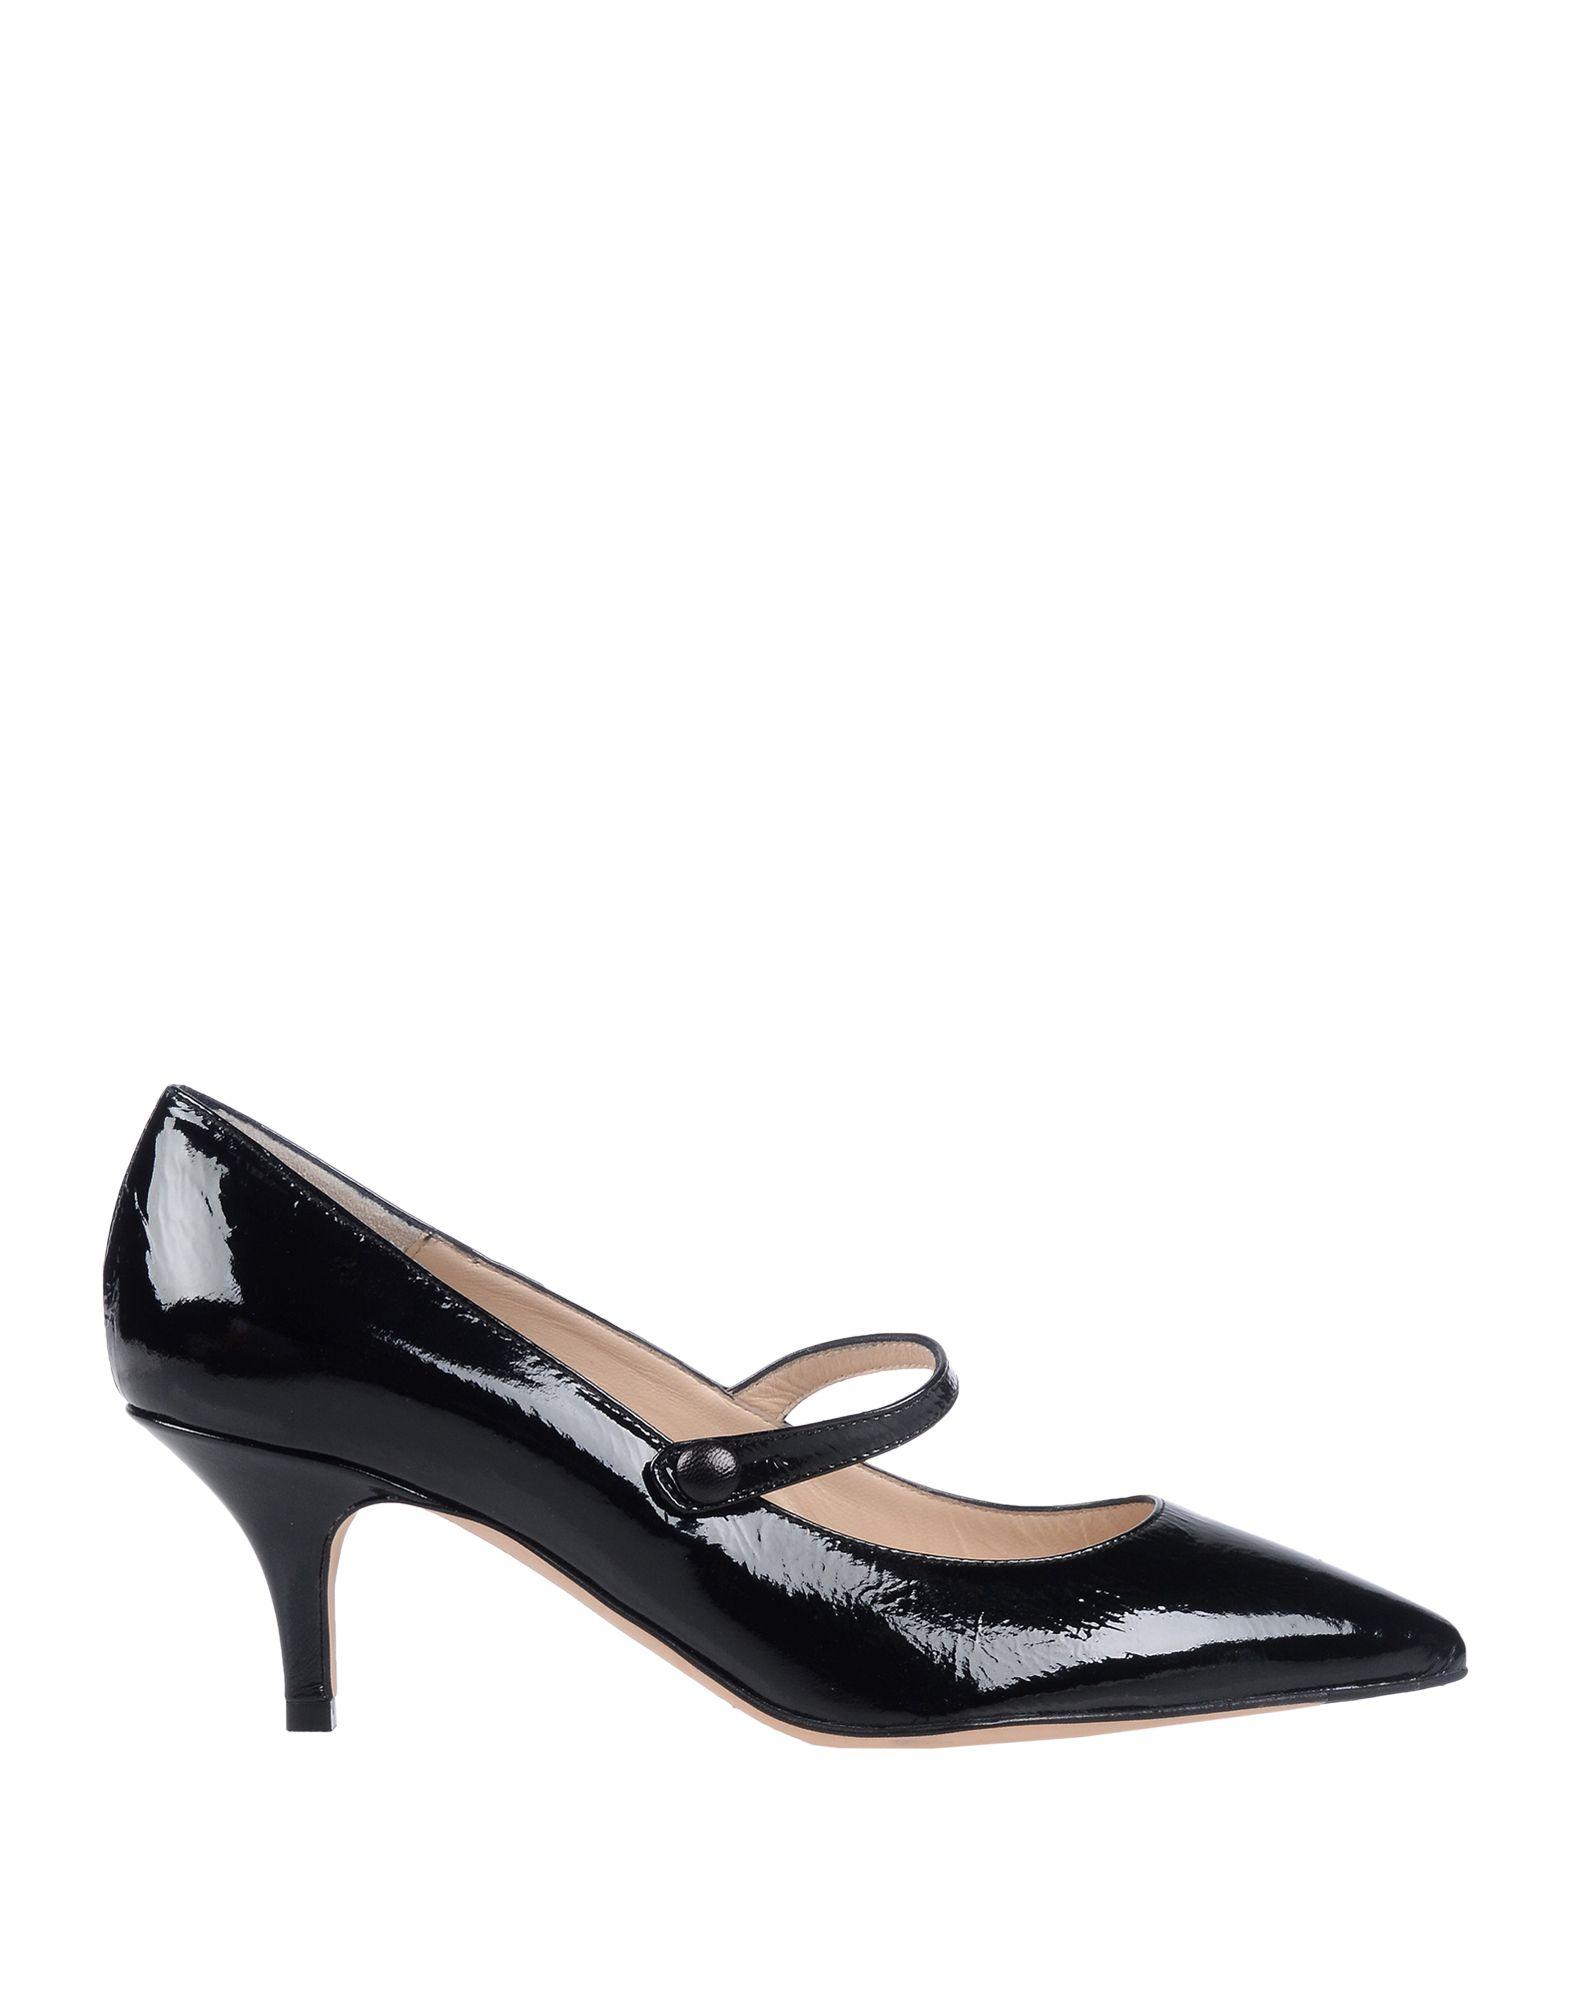 Stilvolle Ancarani billige Schuhe Daniele Ancarani Stilvolle Pumps Damen  11525714JS f33207